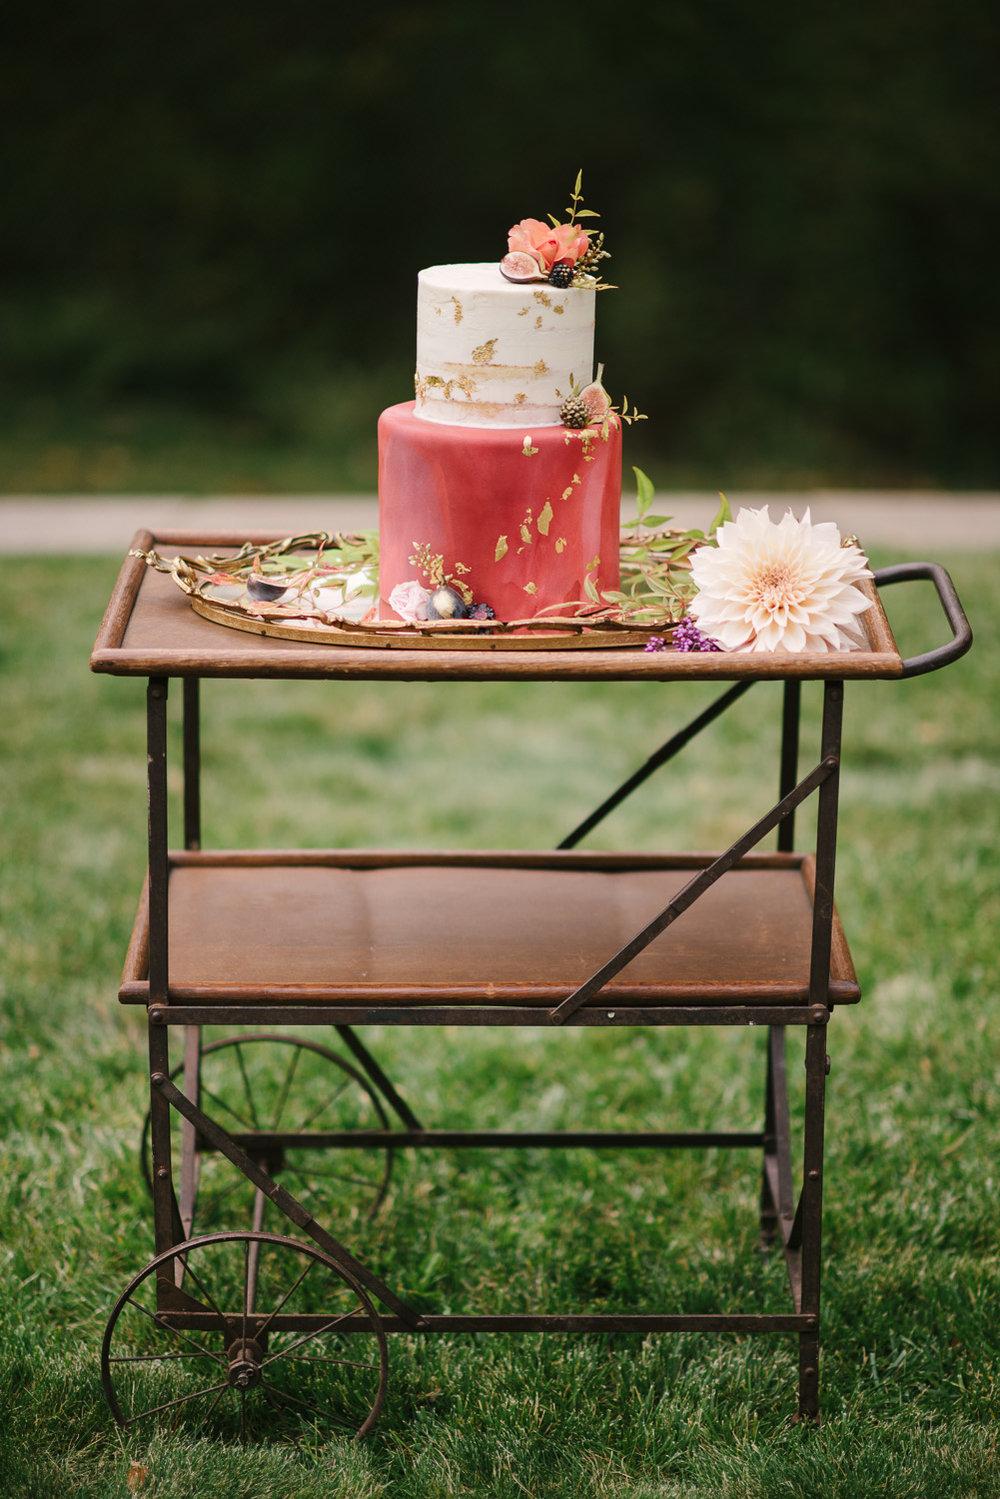 Intimate-wedding-elopement-venue-washington state-25.jpg